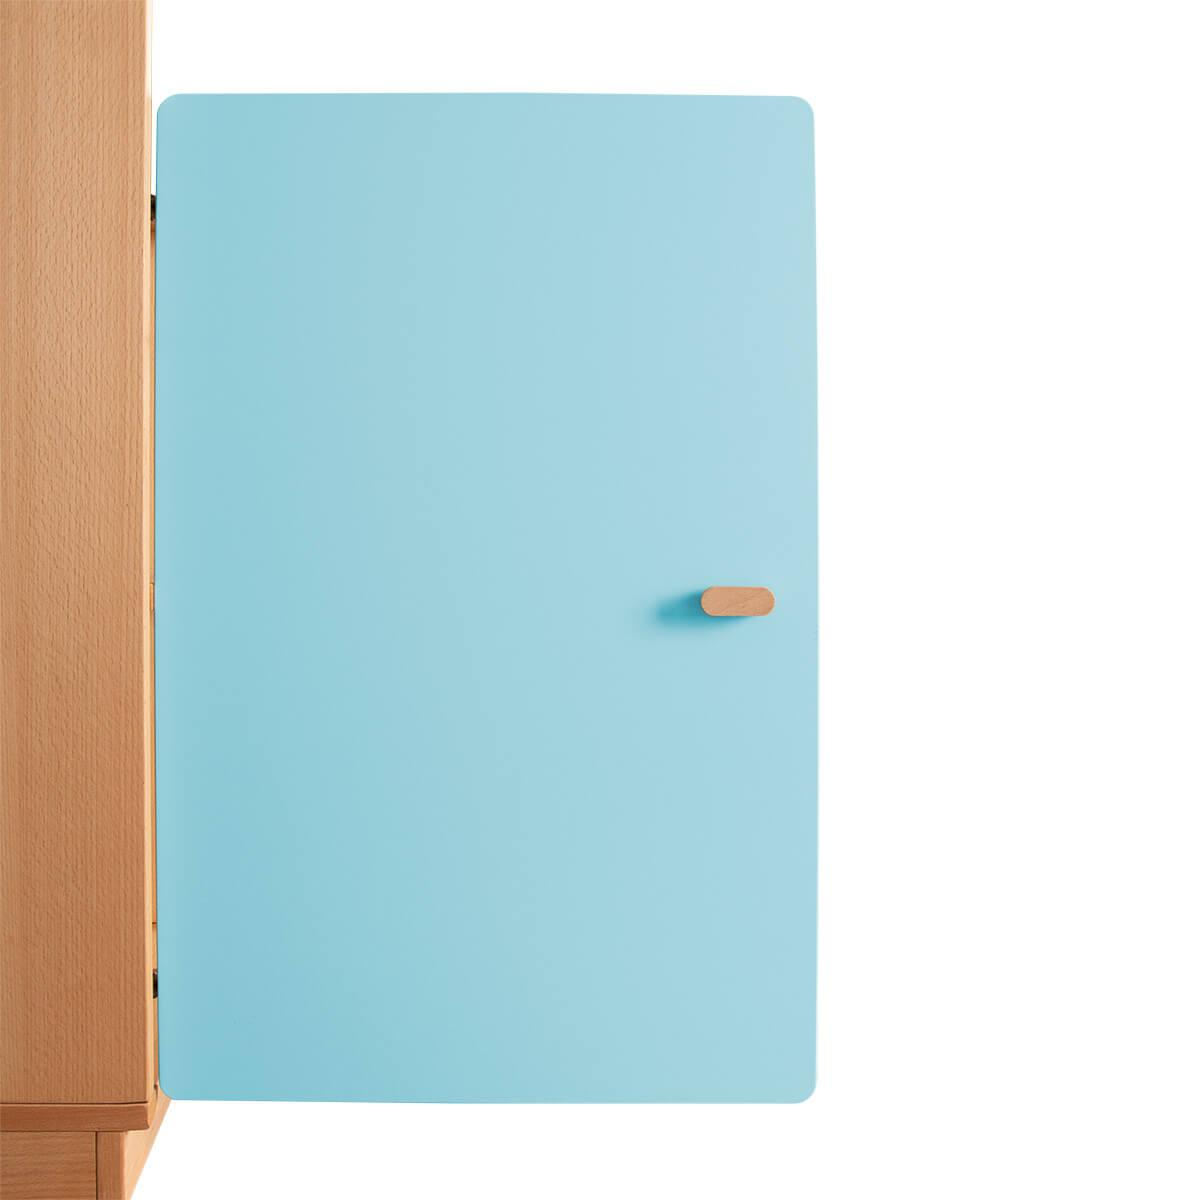 Schranktür 2/5 70cm-Griff DESTYLE de Breuyn MDF kristallblau-lackiert